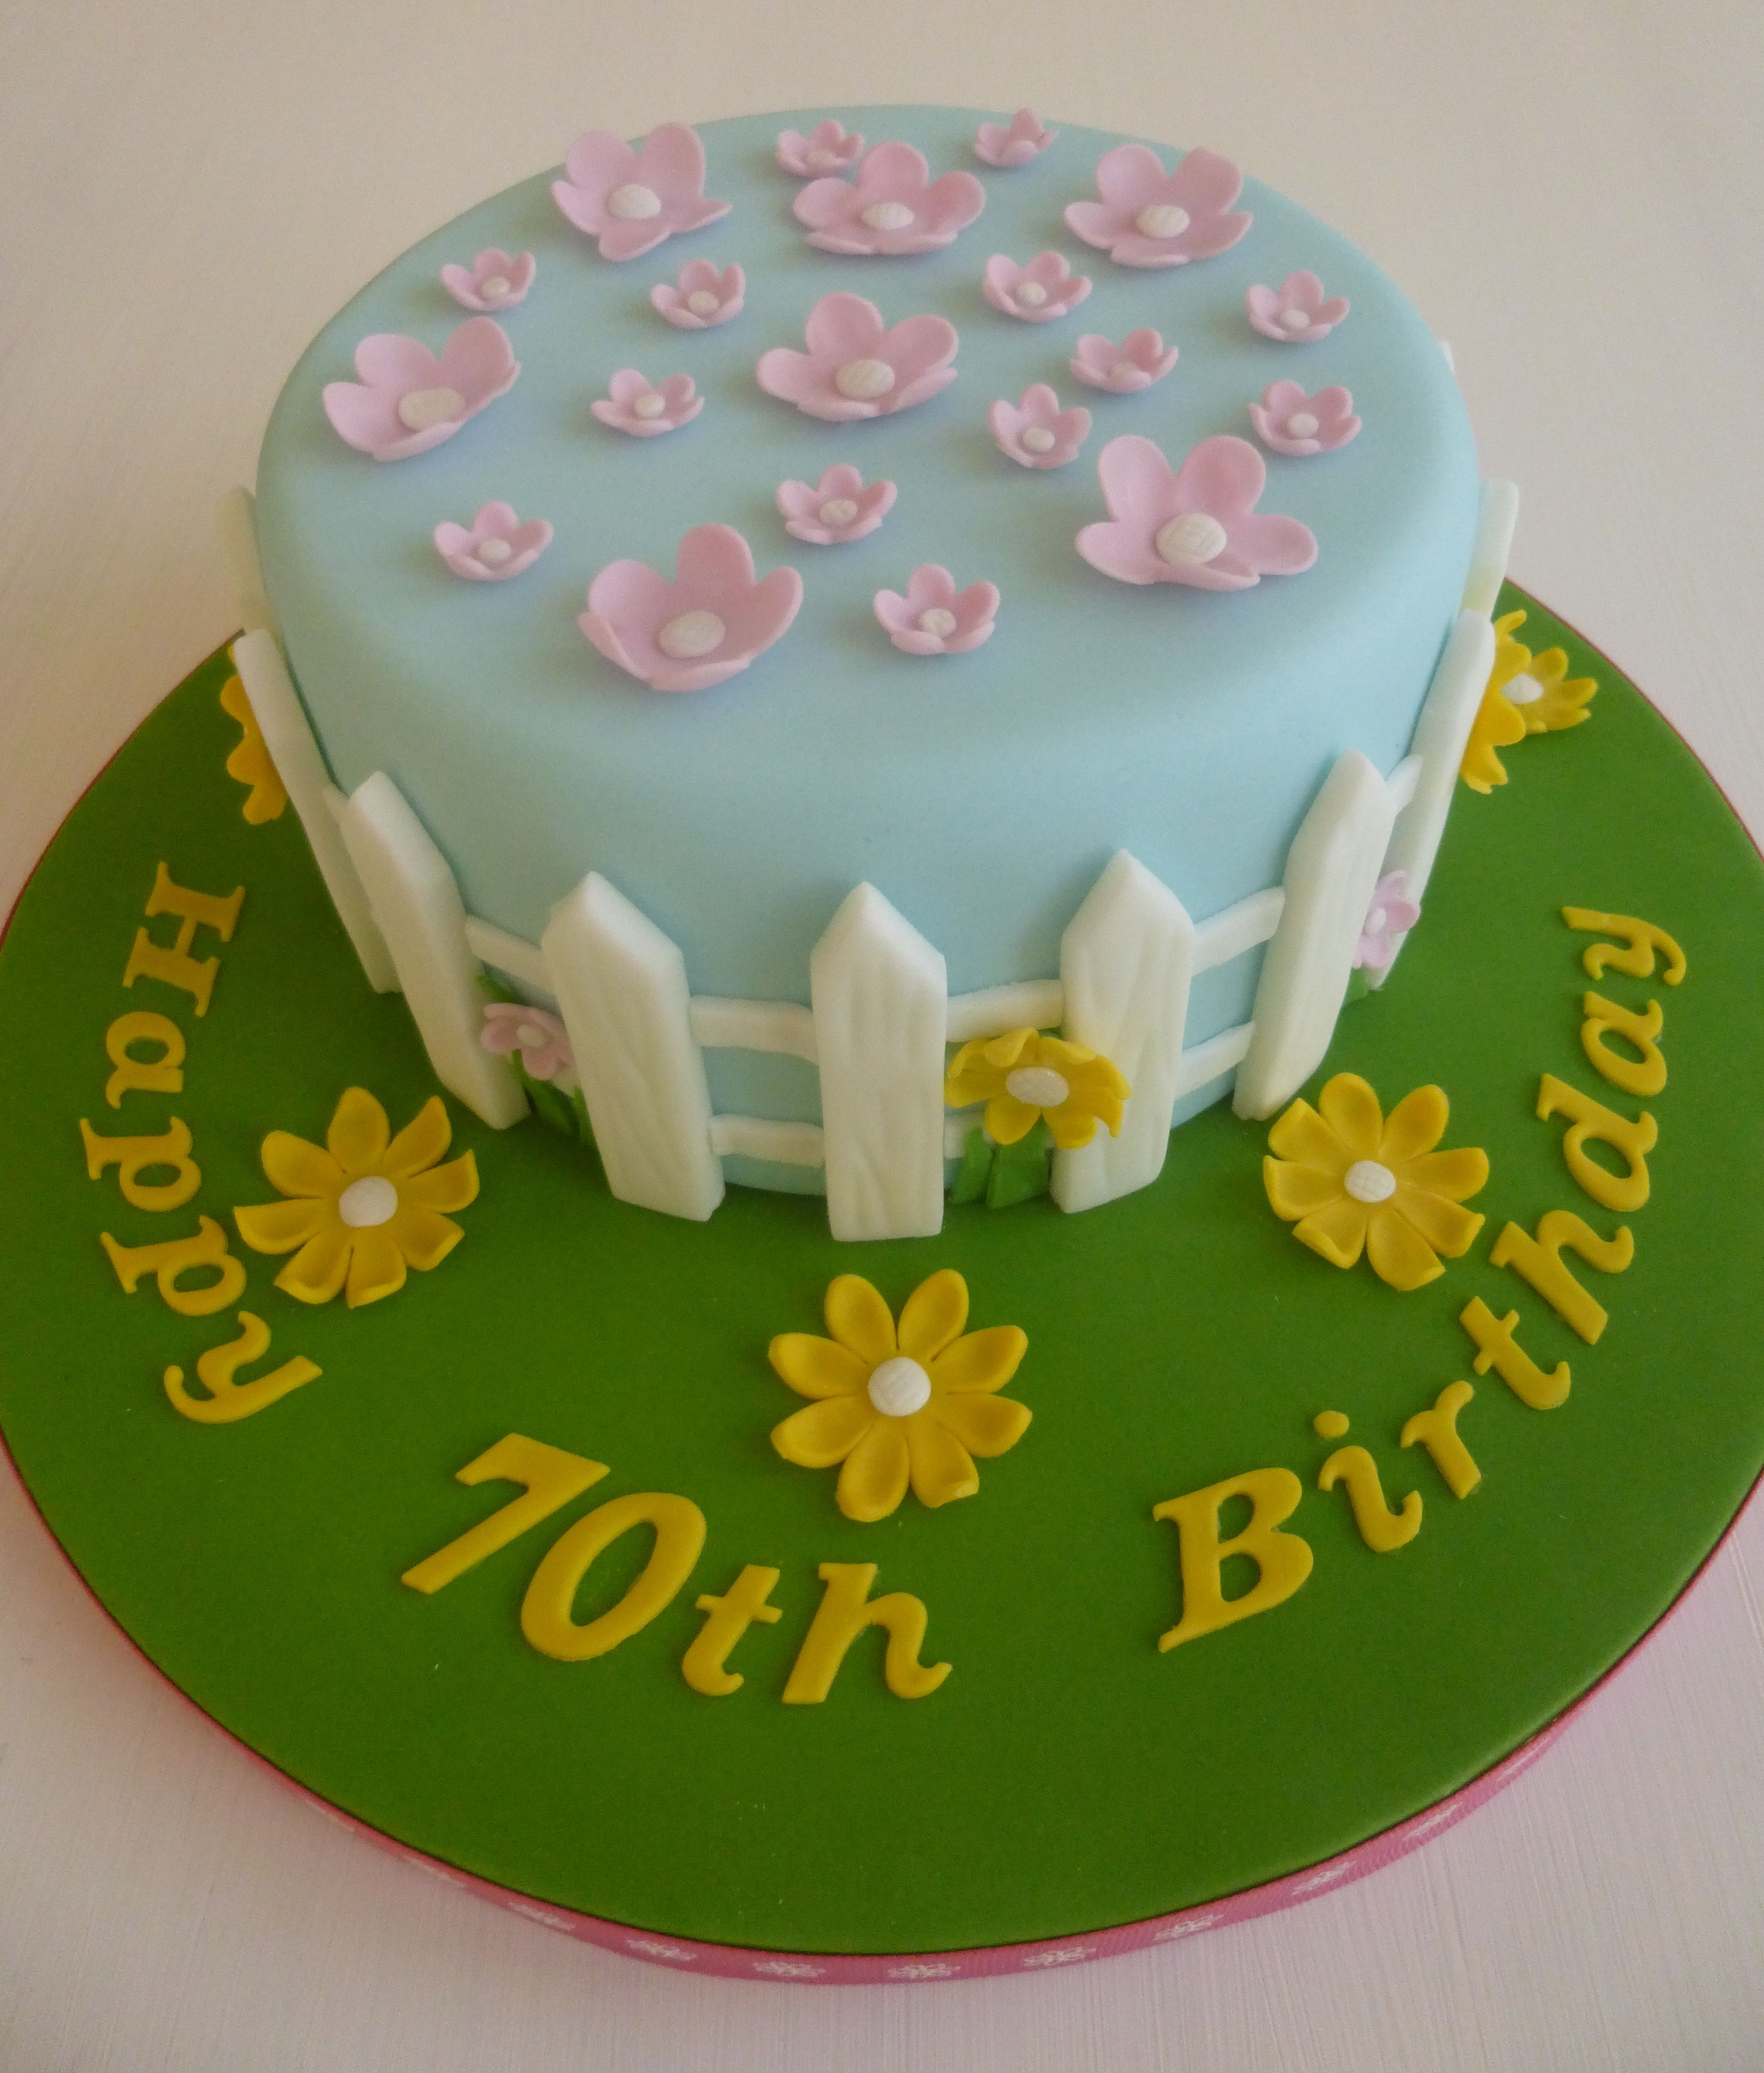 70th birthday flower garden cake. | Cake, No bake cake ...